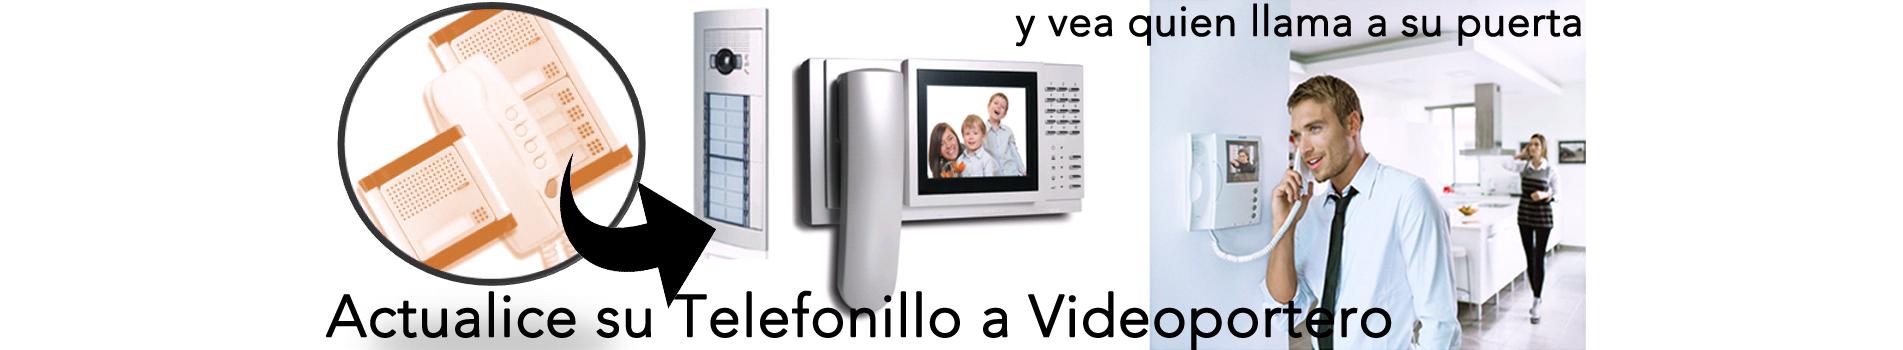 Video-portero